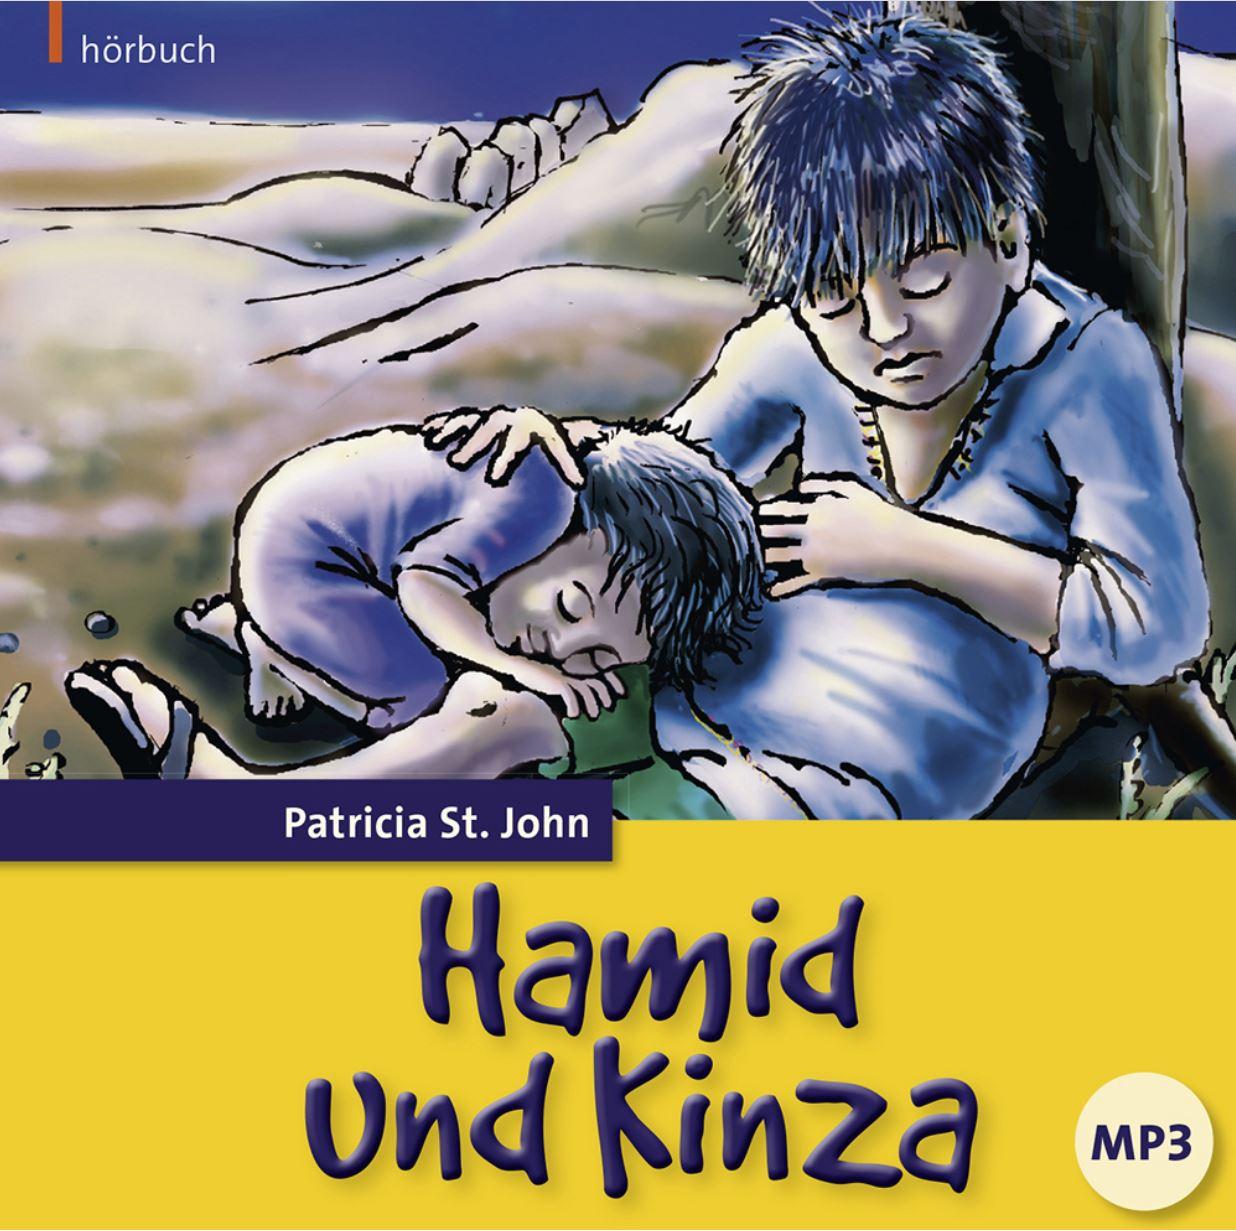 Hamid und Kinza (Hörbuch [MP3])